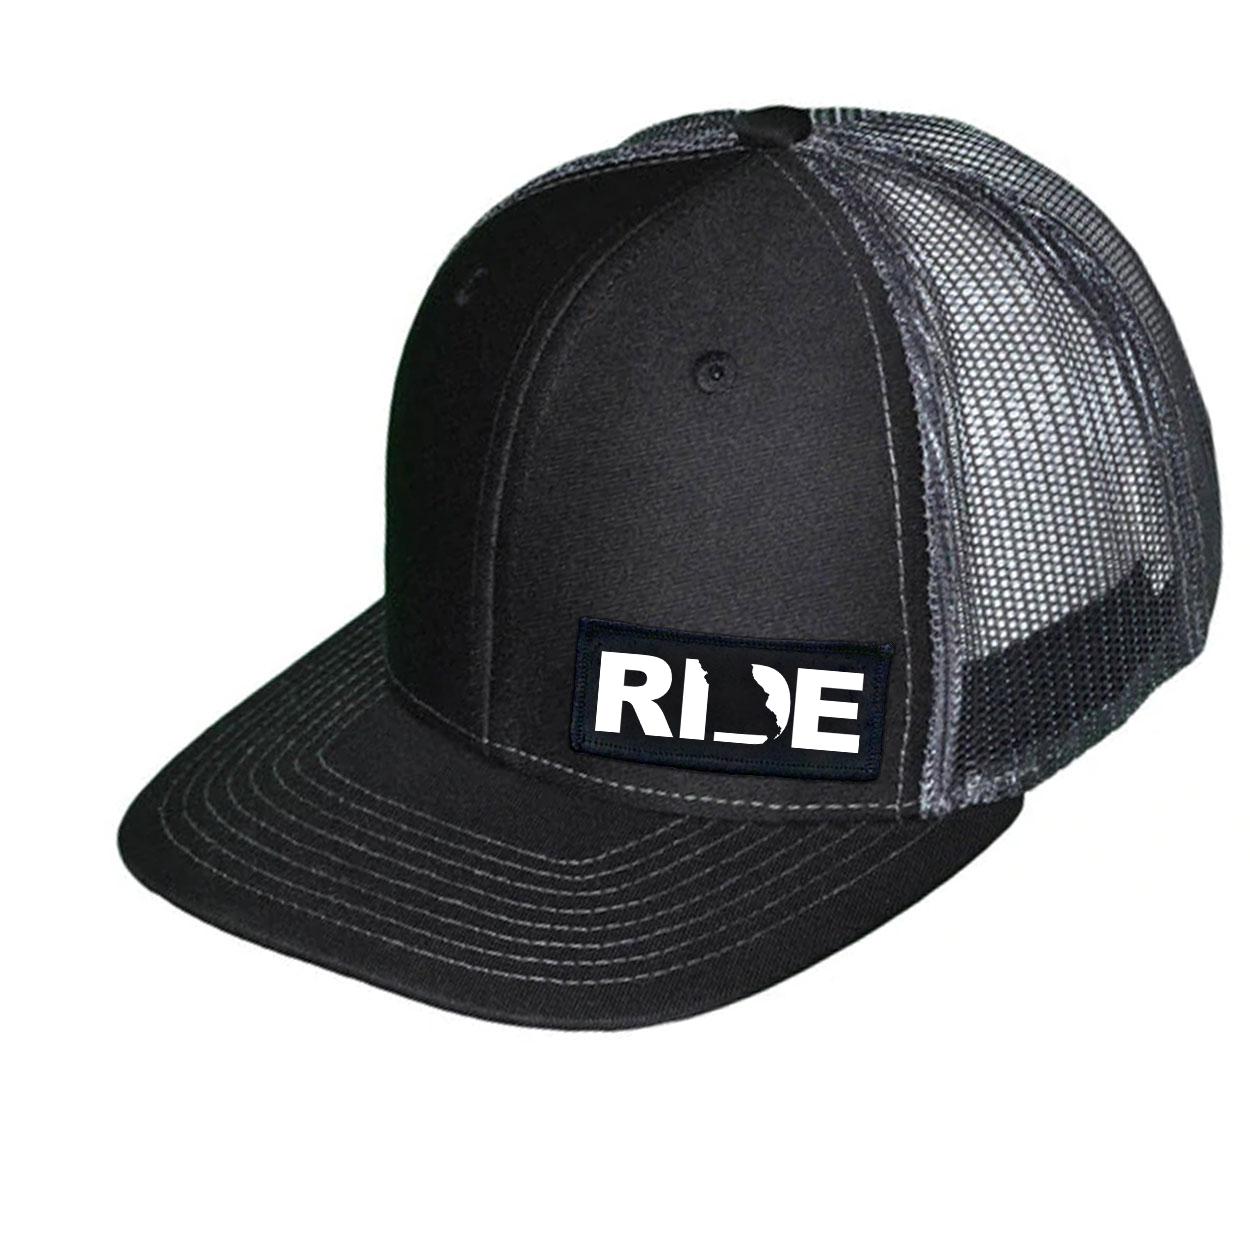 Ride Missouri Night Out Woven Patch Snapback Trucker Hat Black/Dark Gray (White Logo)